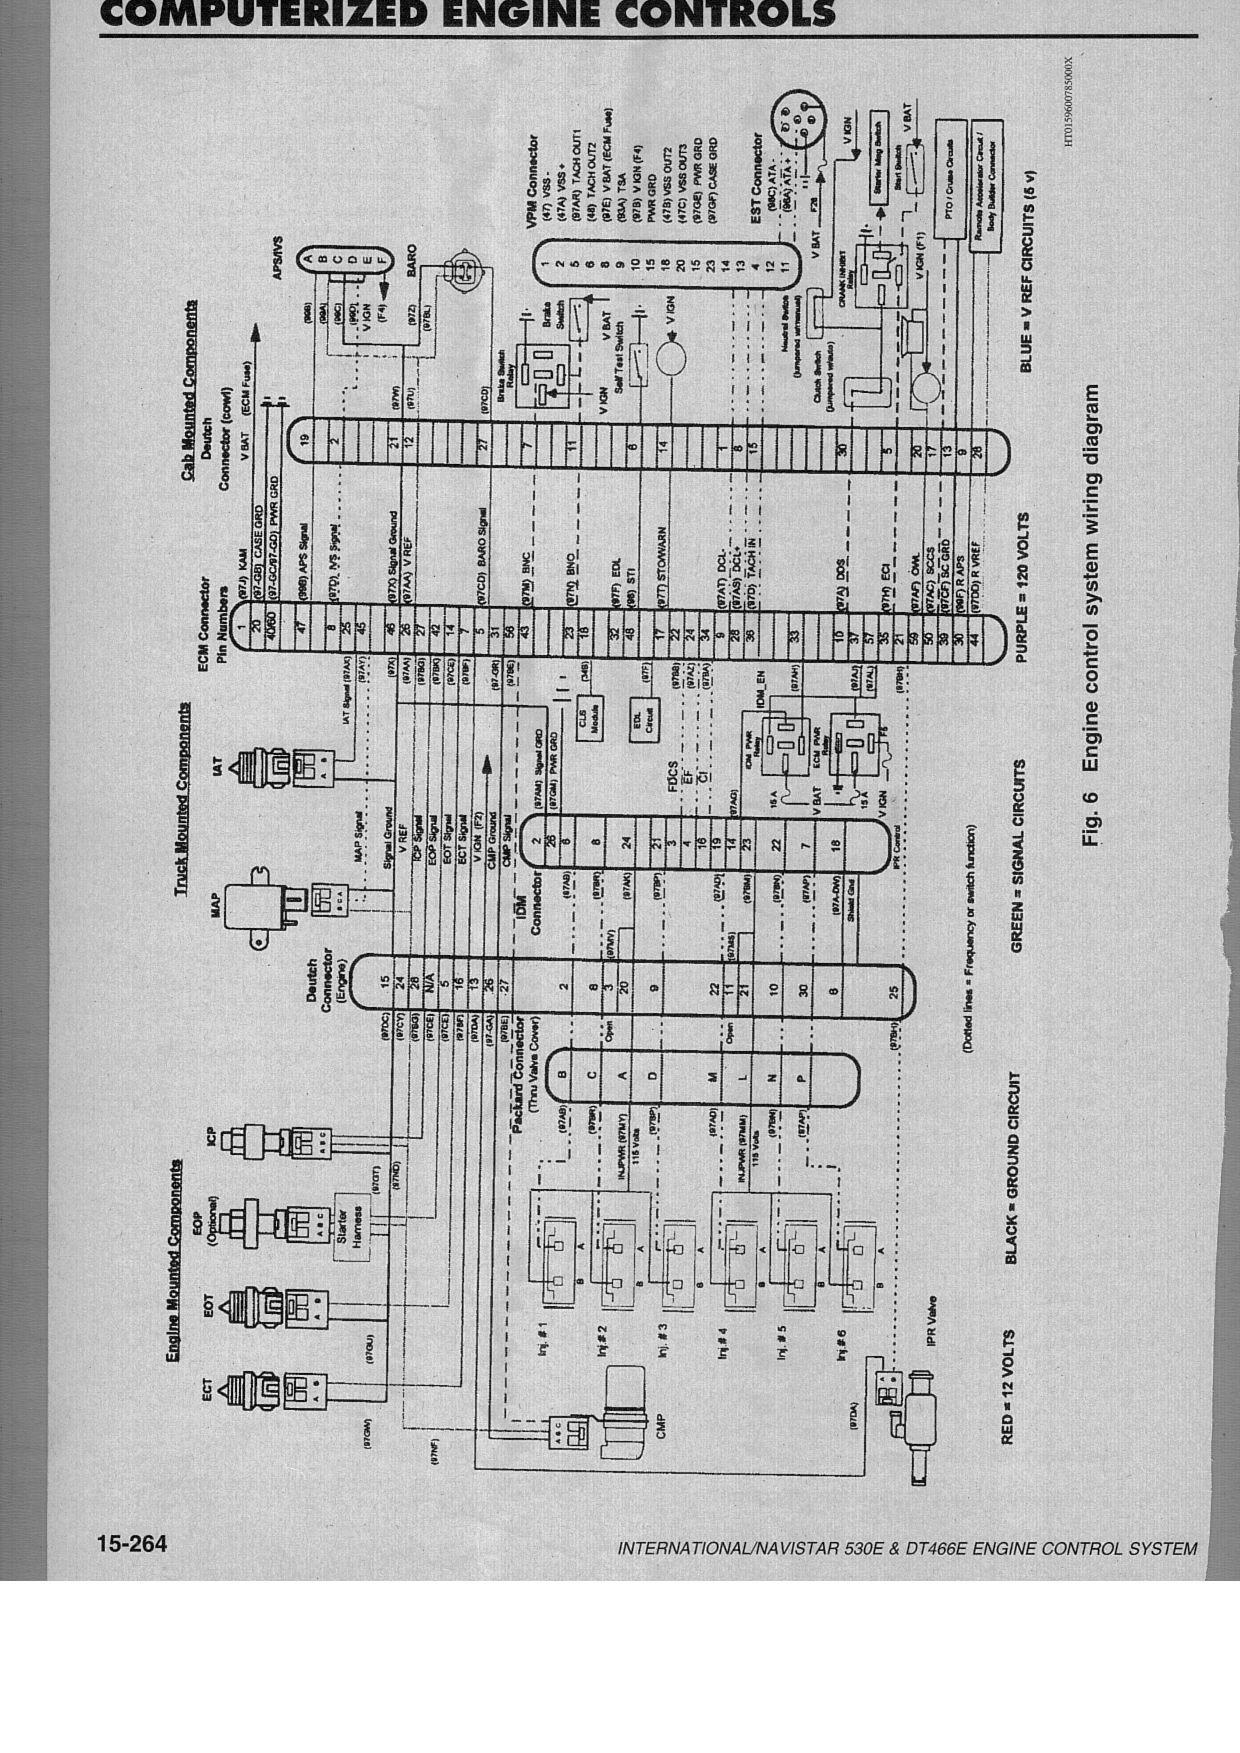 1998 International 4700 Dt466e Wiring Diagram